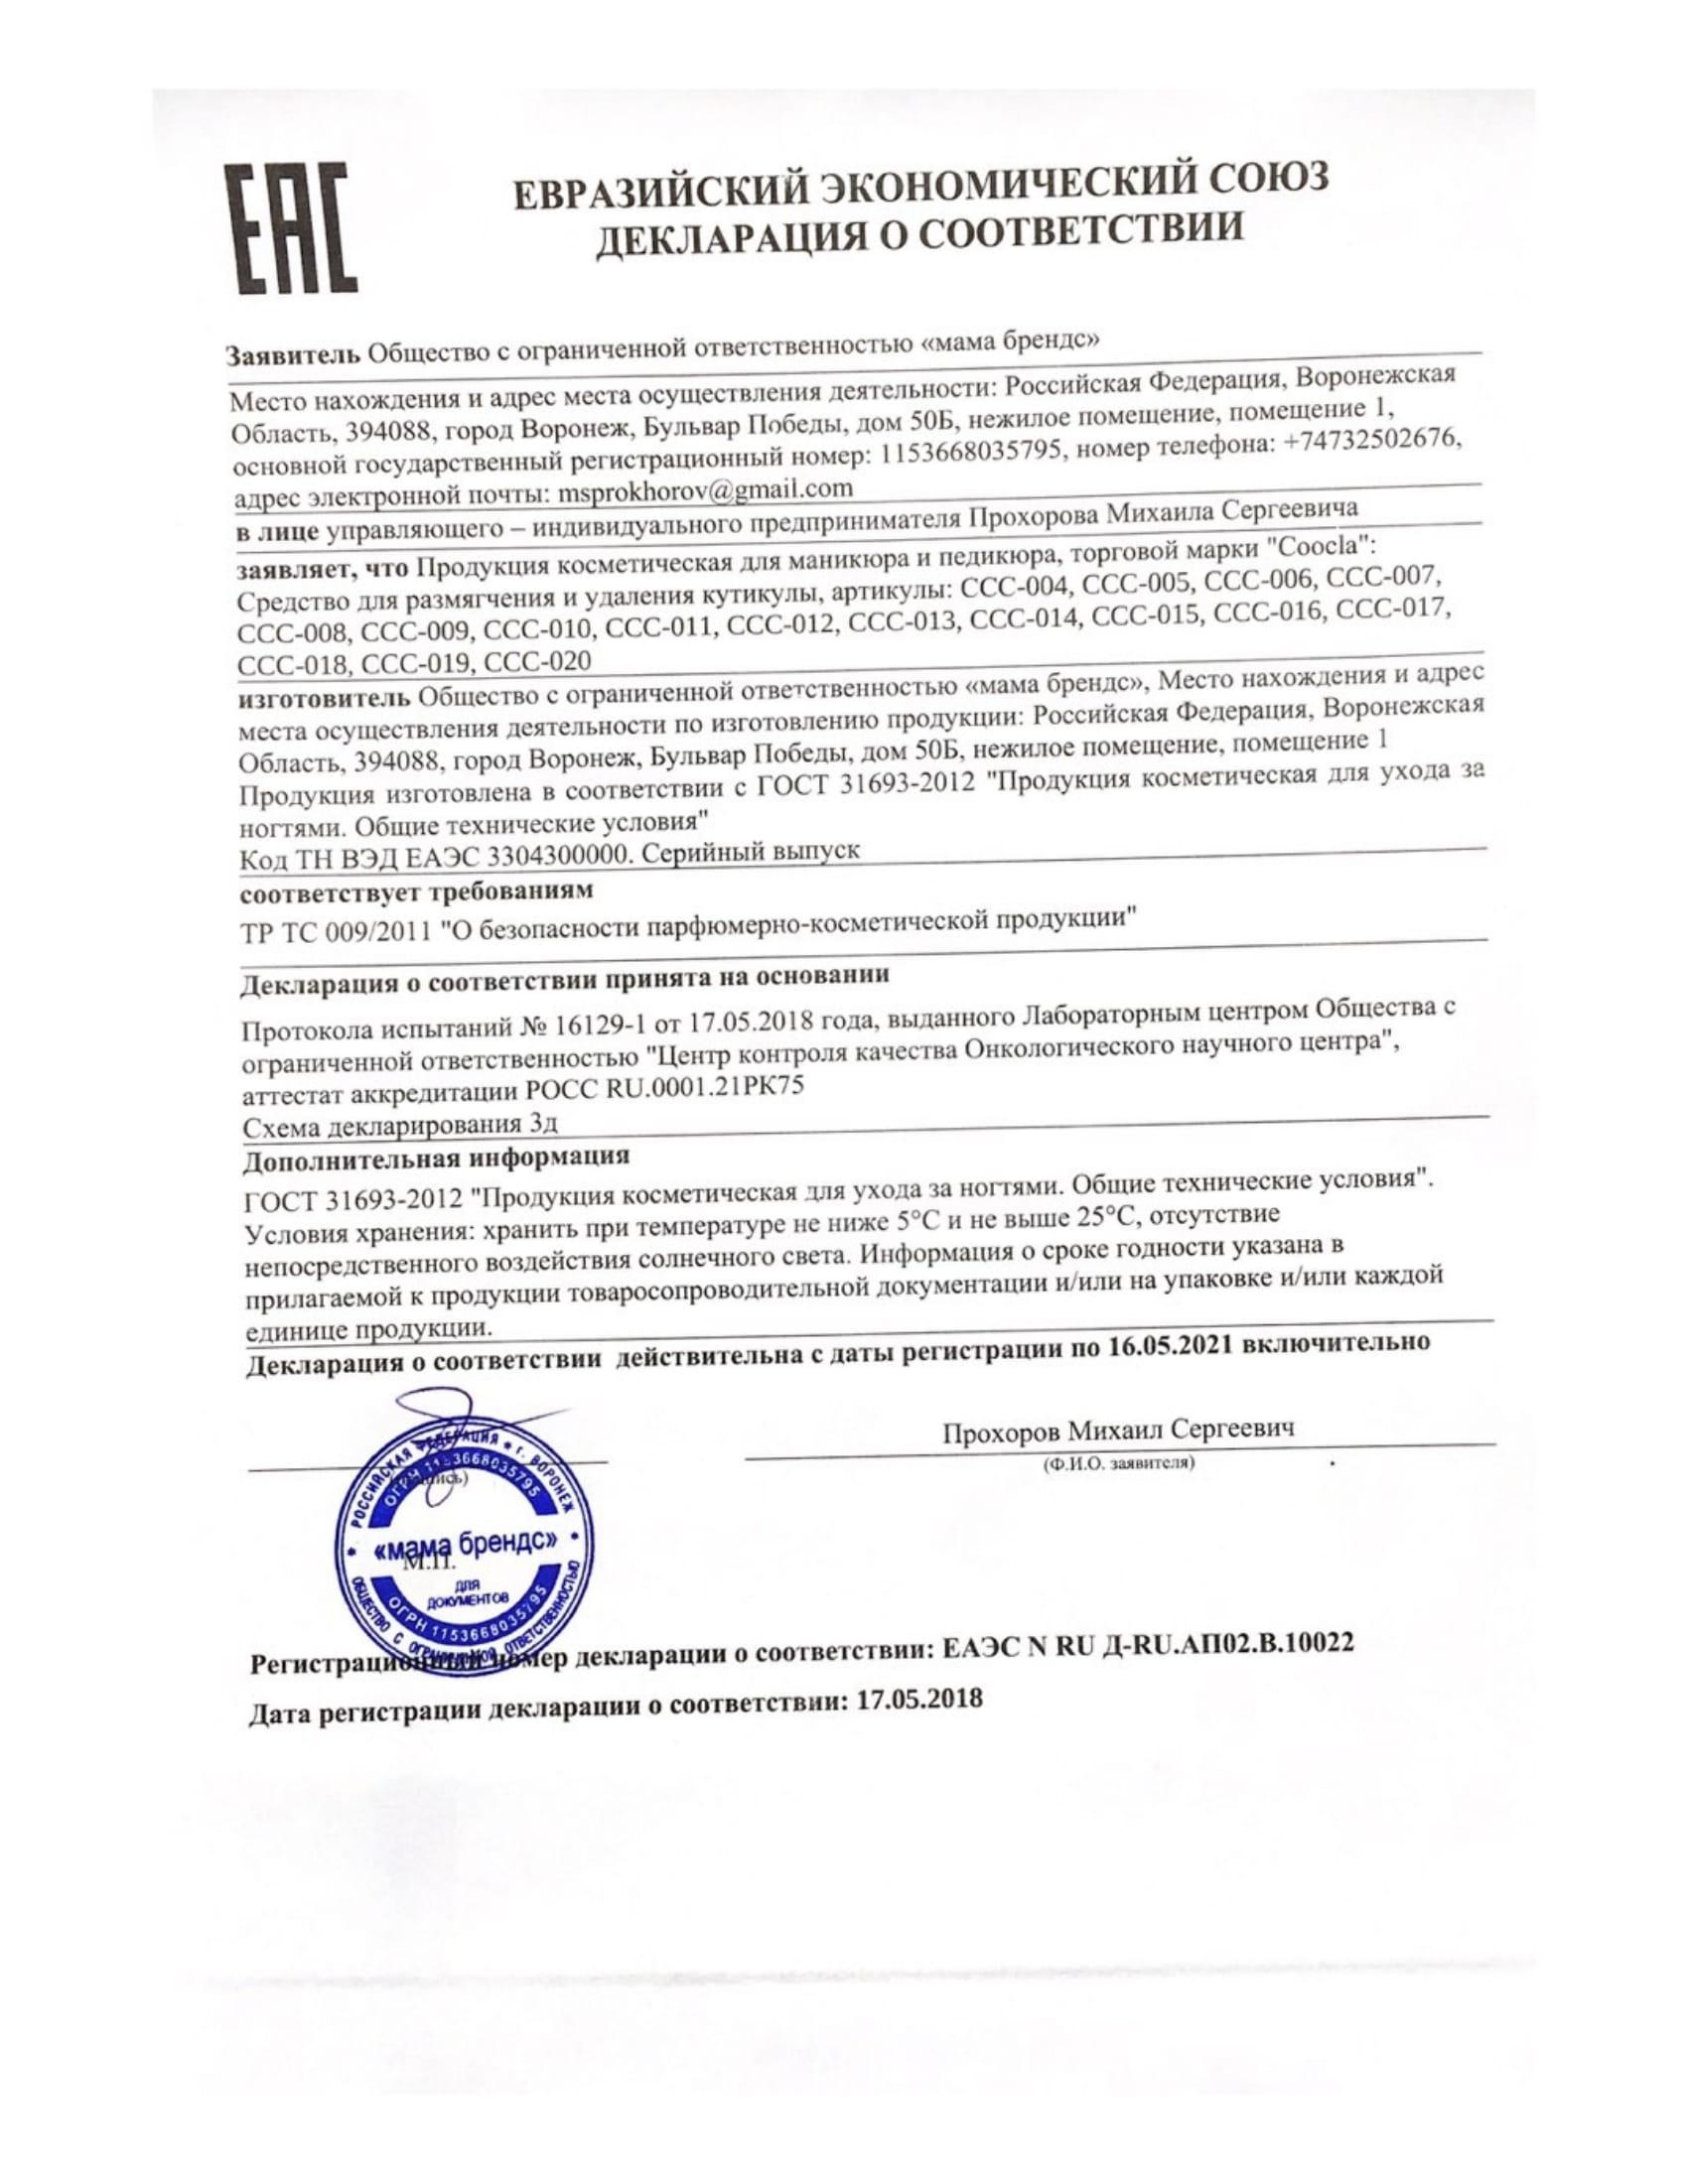 ЕАЭС N RU Д-RU.АП02.В.10022-1